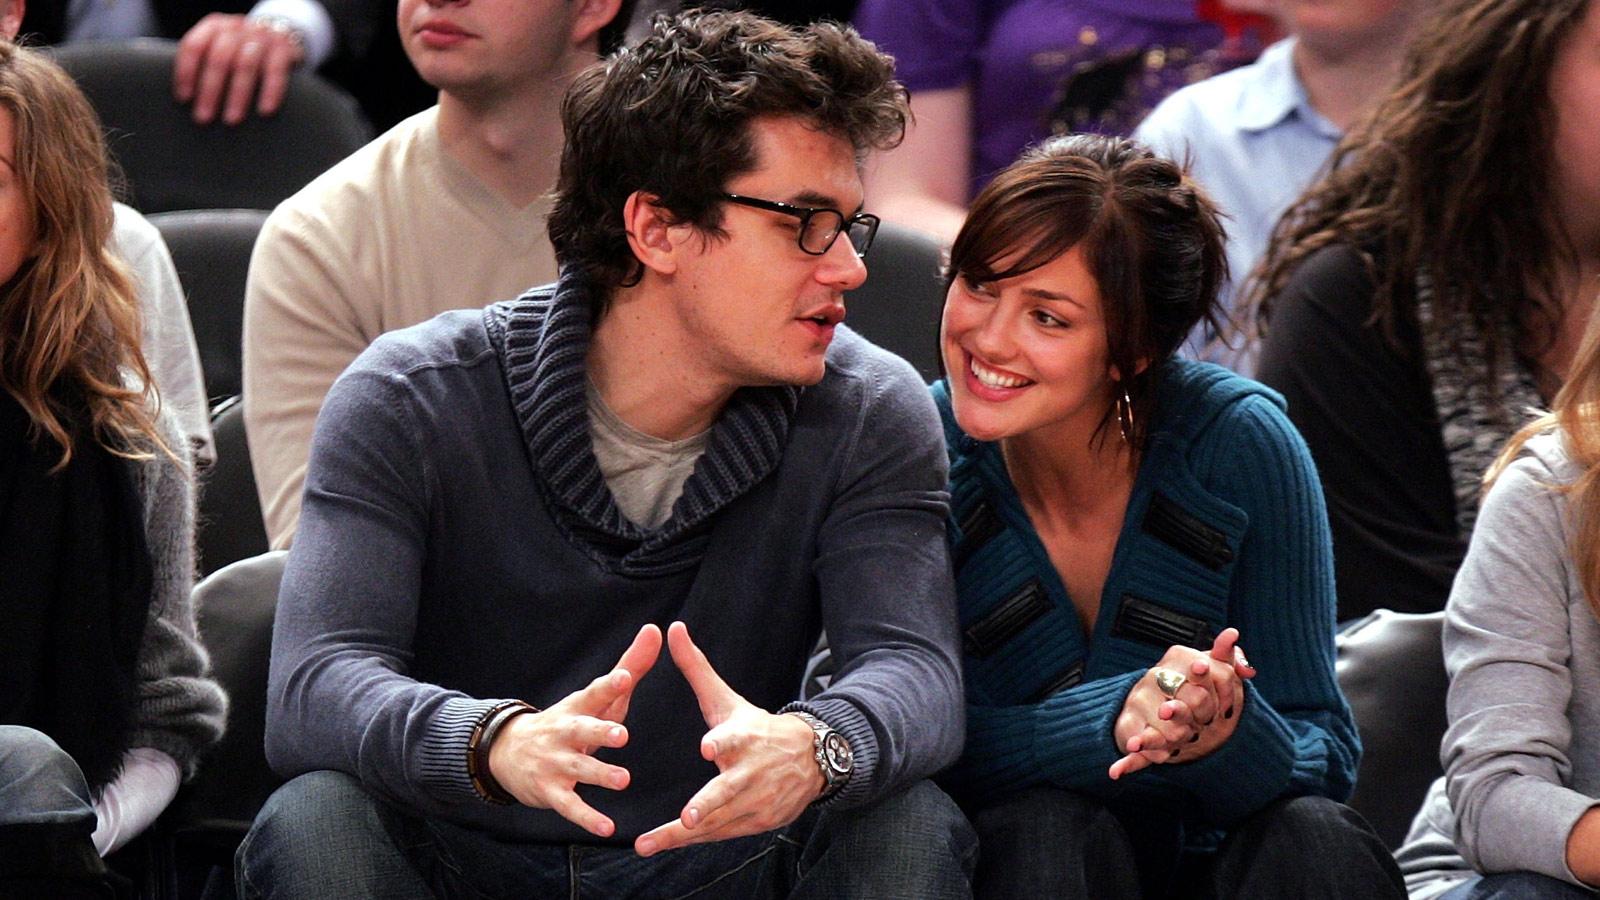 PHOTO: Musician John Mayer and actress Minka Kelly attend NY Knicks vs Miami Heat game at Madison Square Garden in New York City on Nov. 11, 2007.